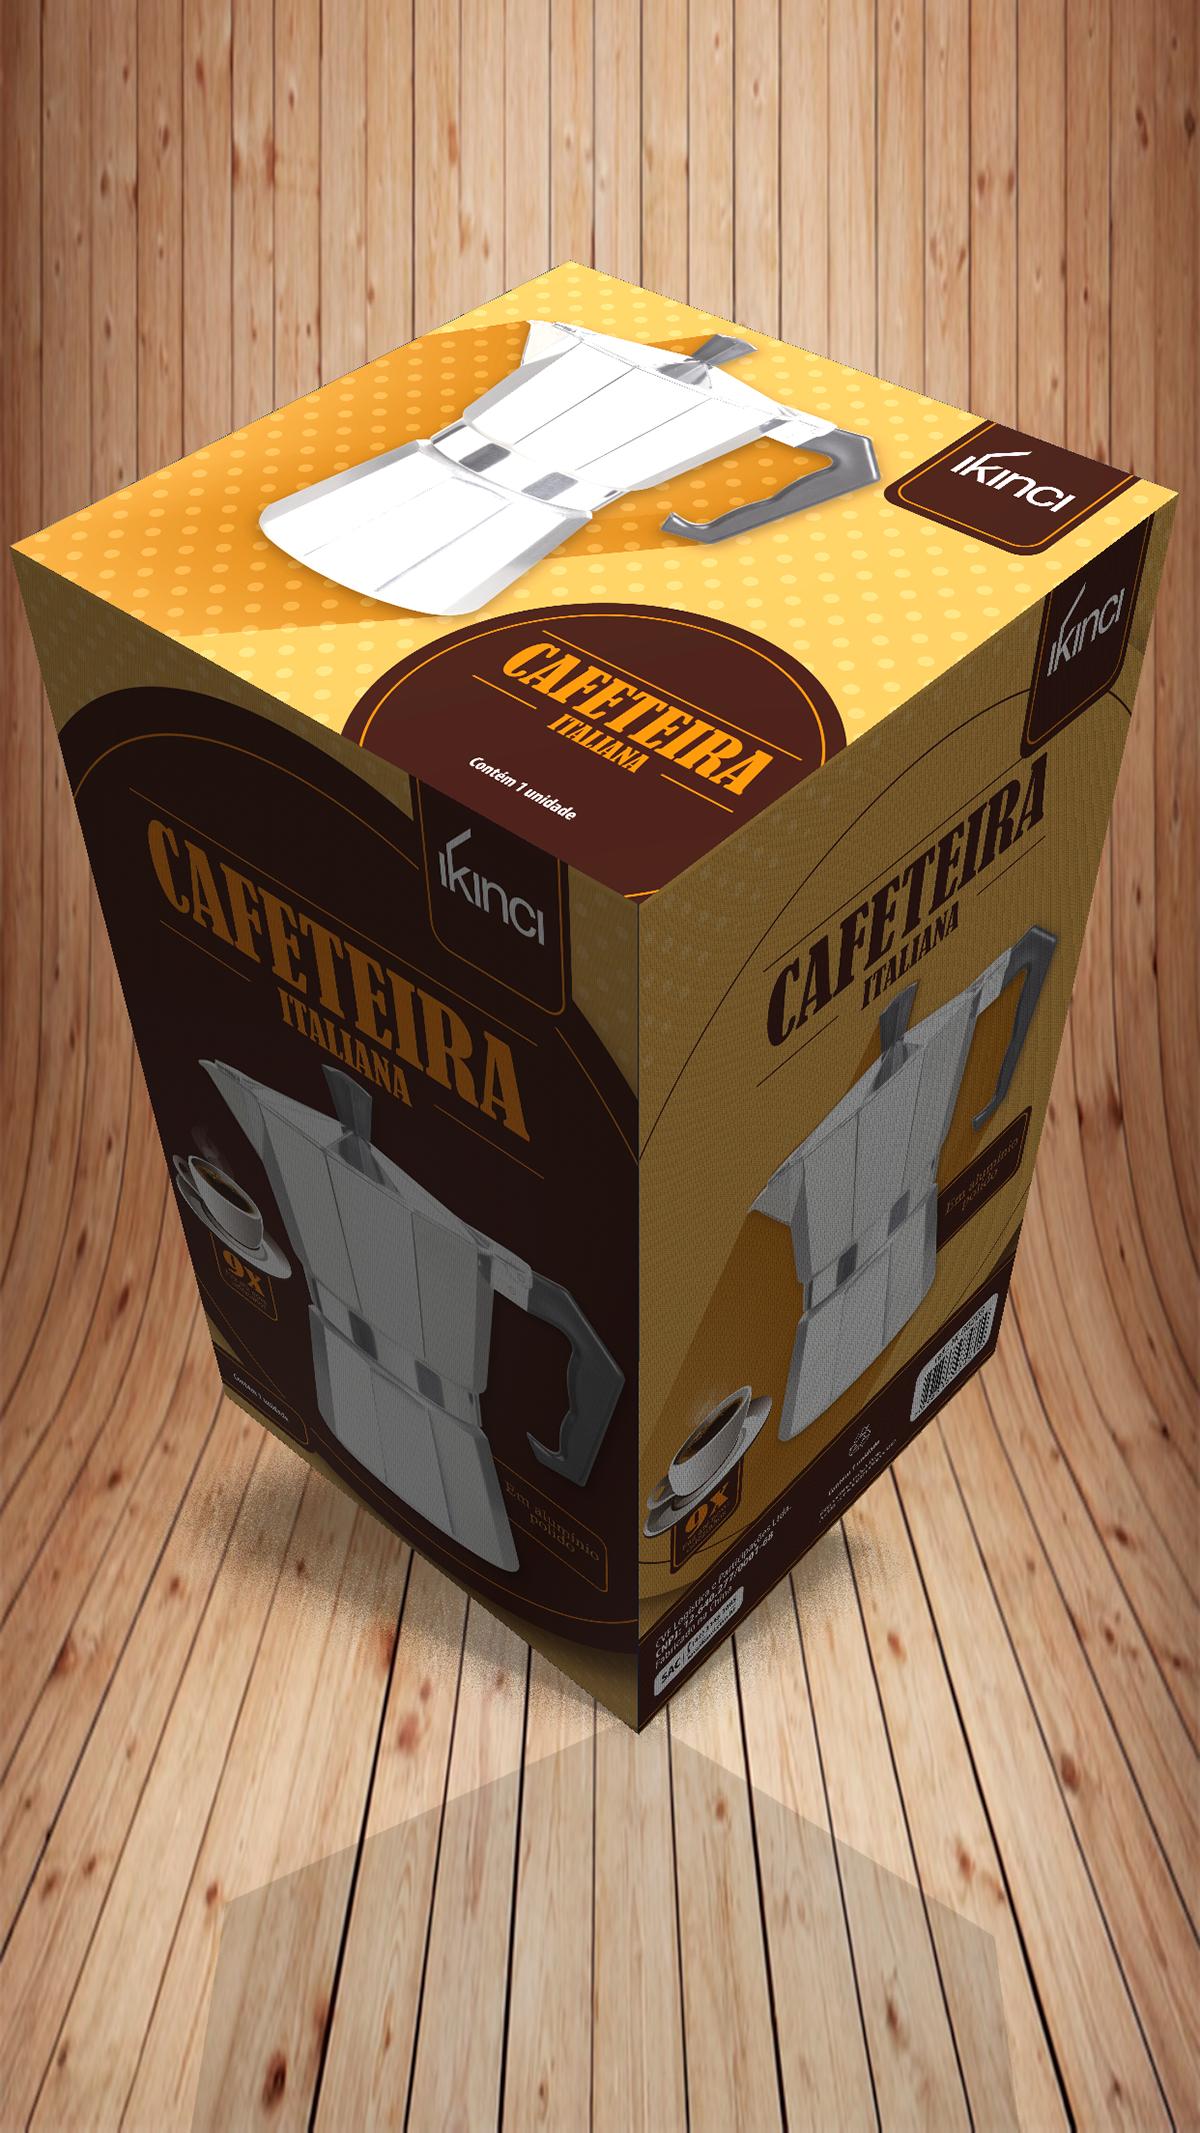 Caixa colorbox cafeteira cafe coffe package embalagem